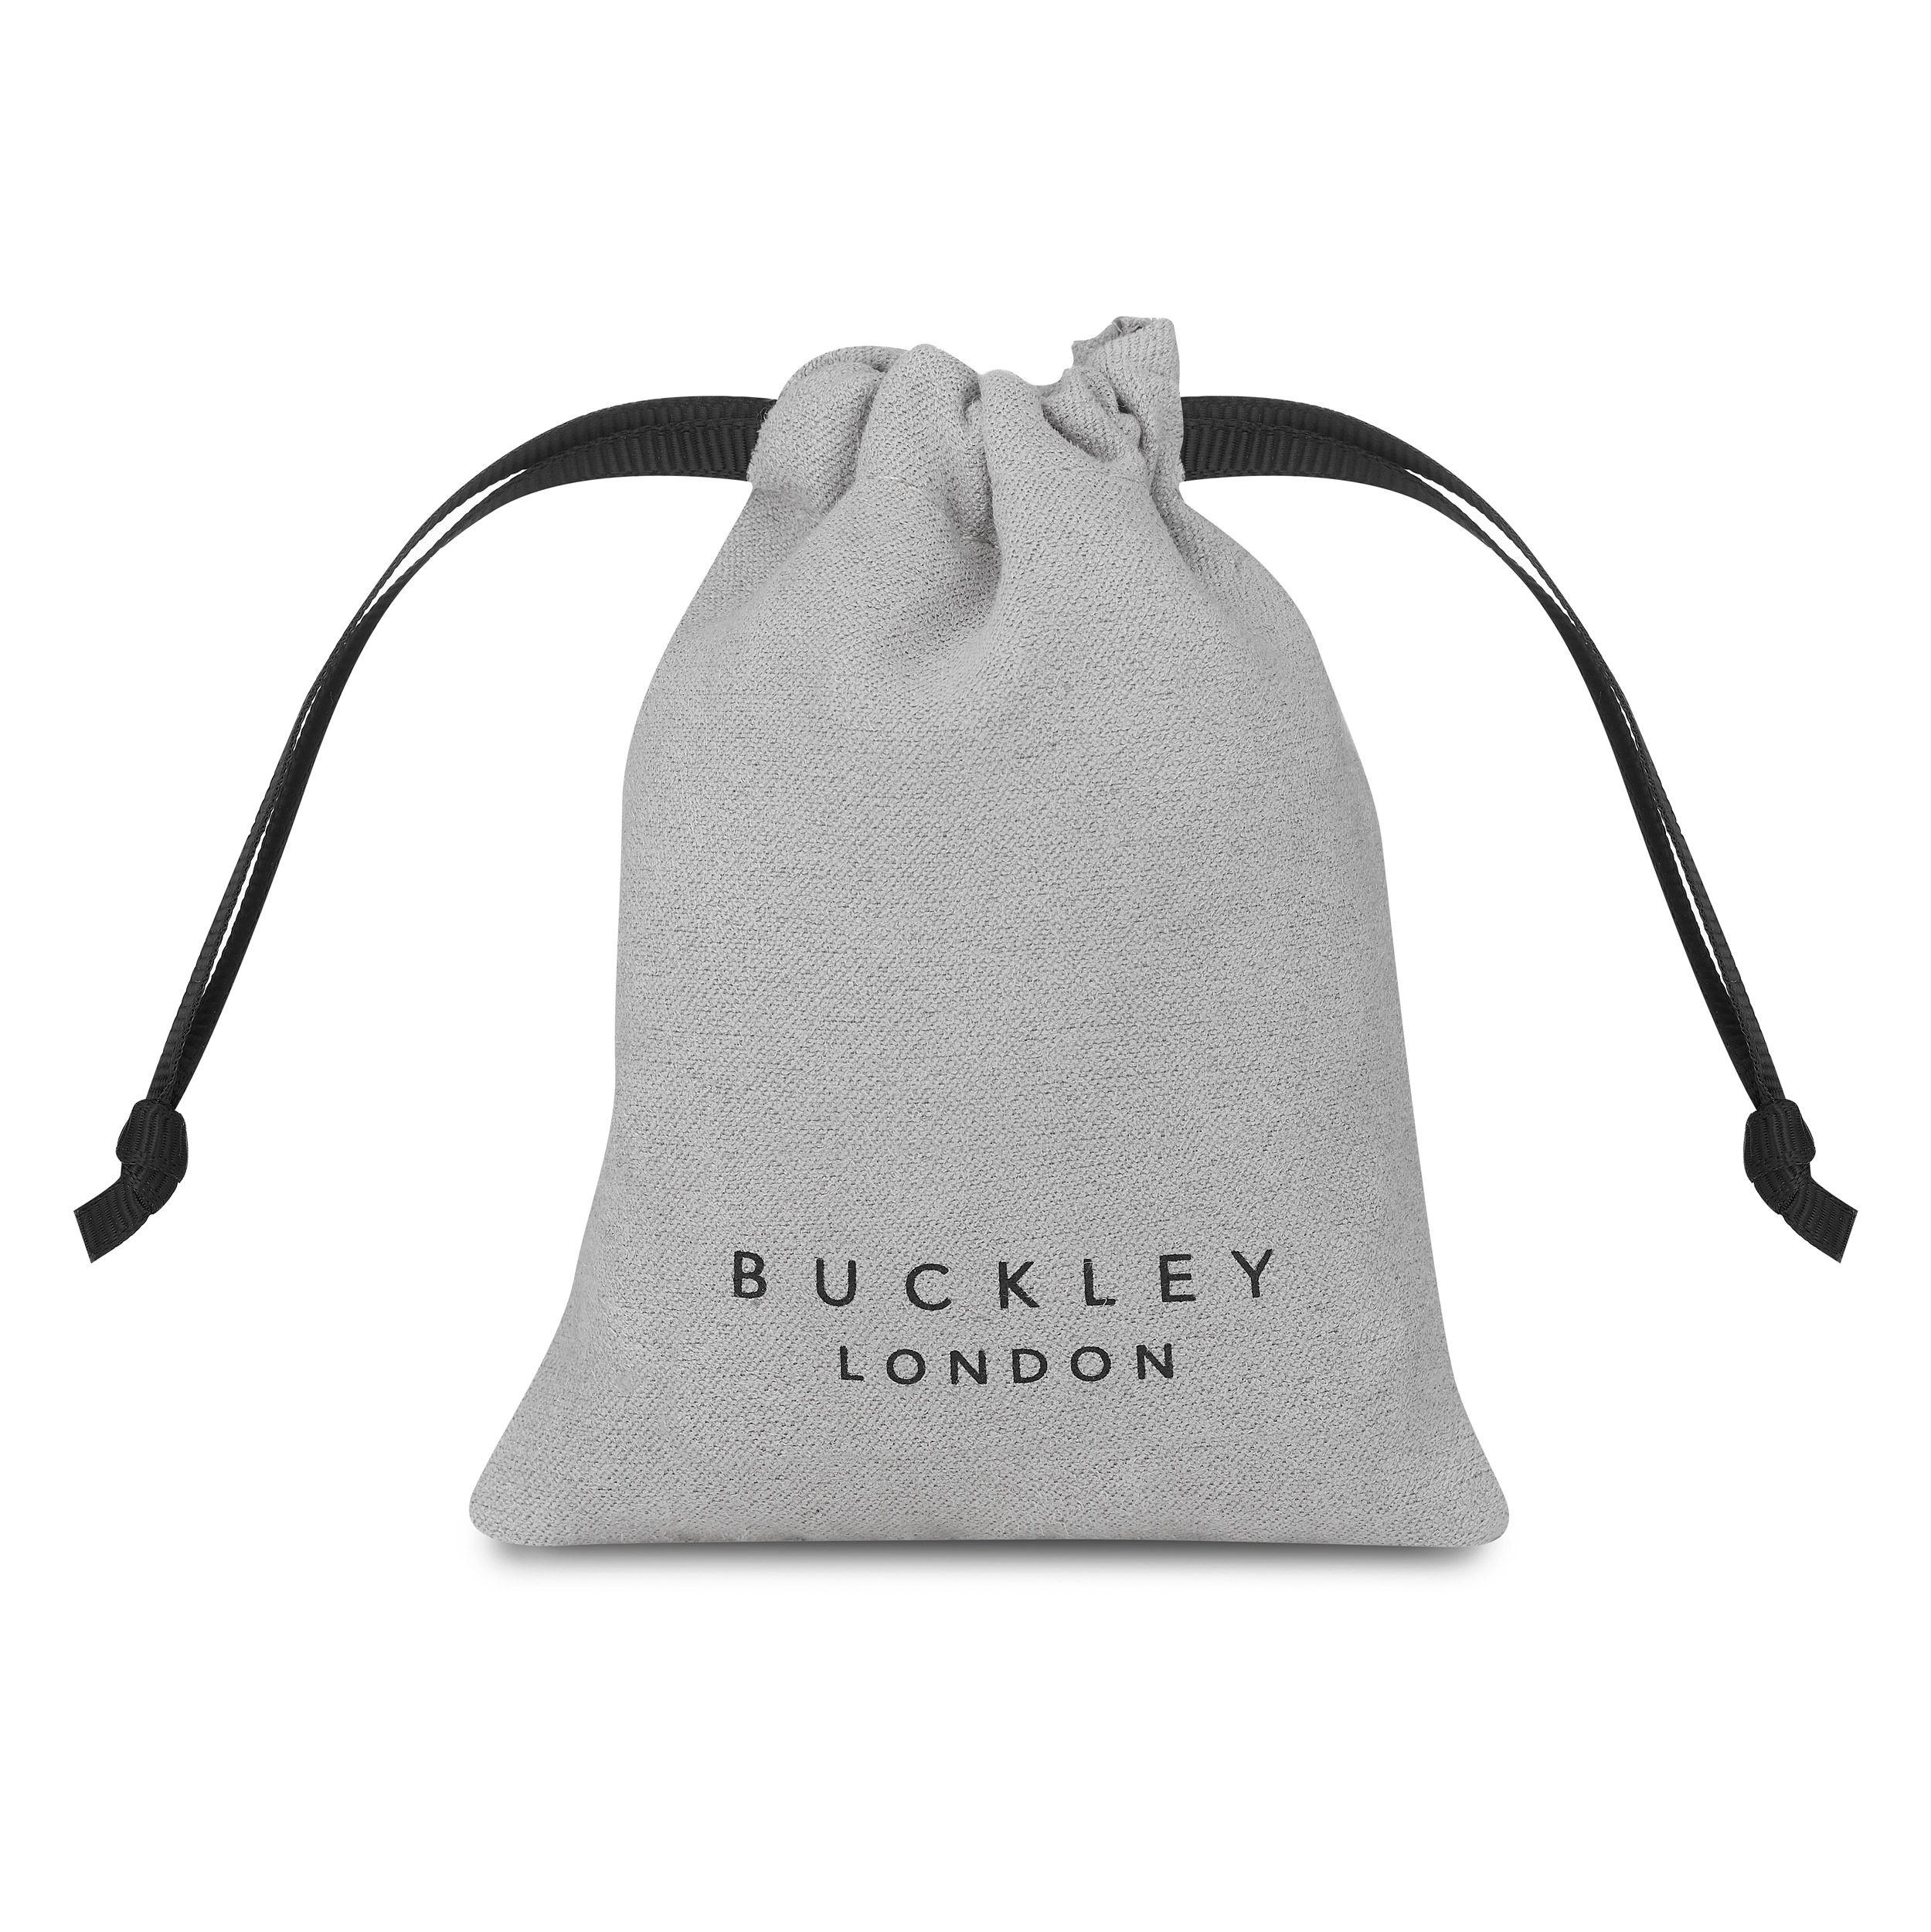 Buckley London Hugs & Kisses 'O' Bracelet - Silver Bag